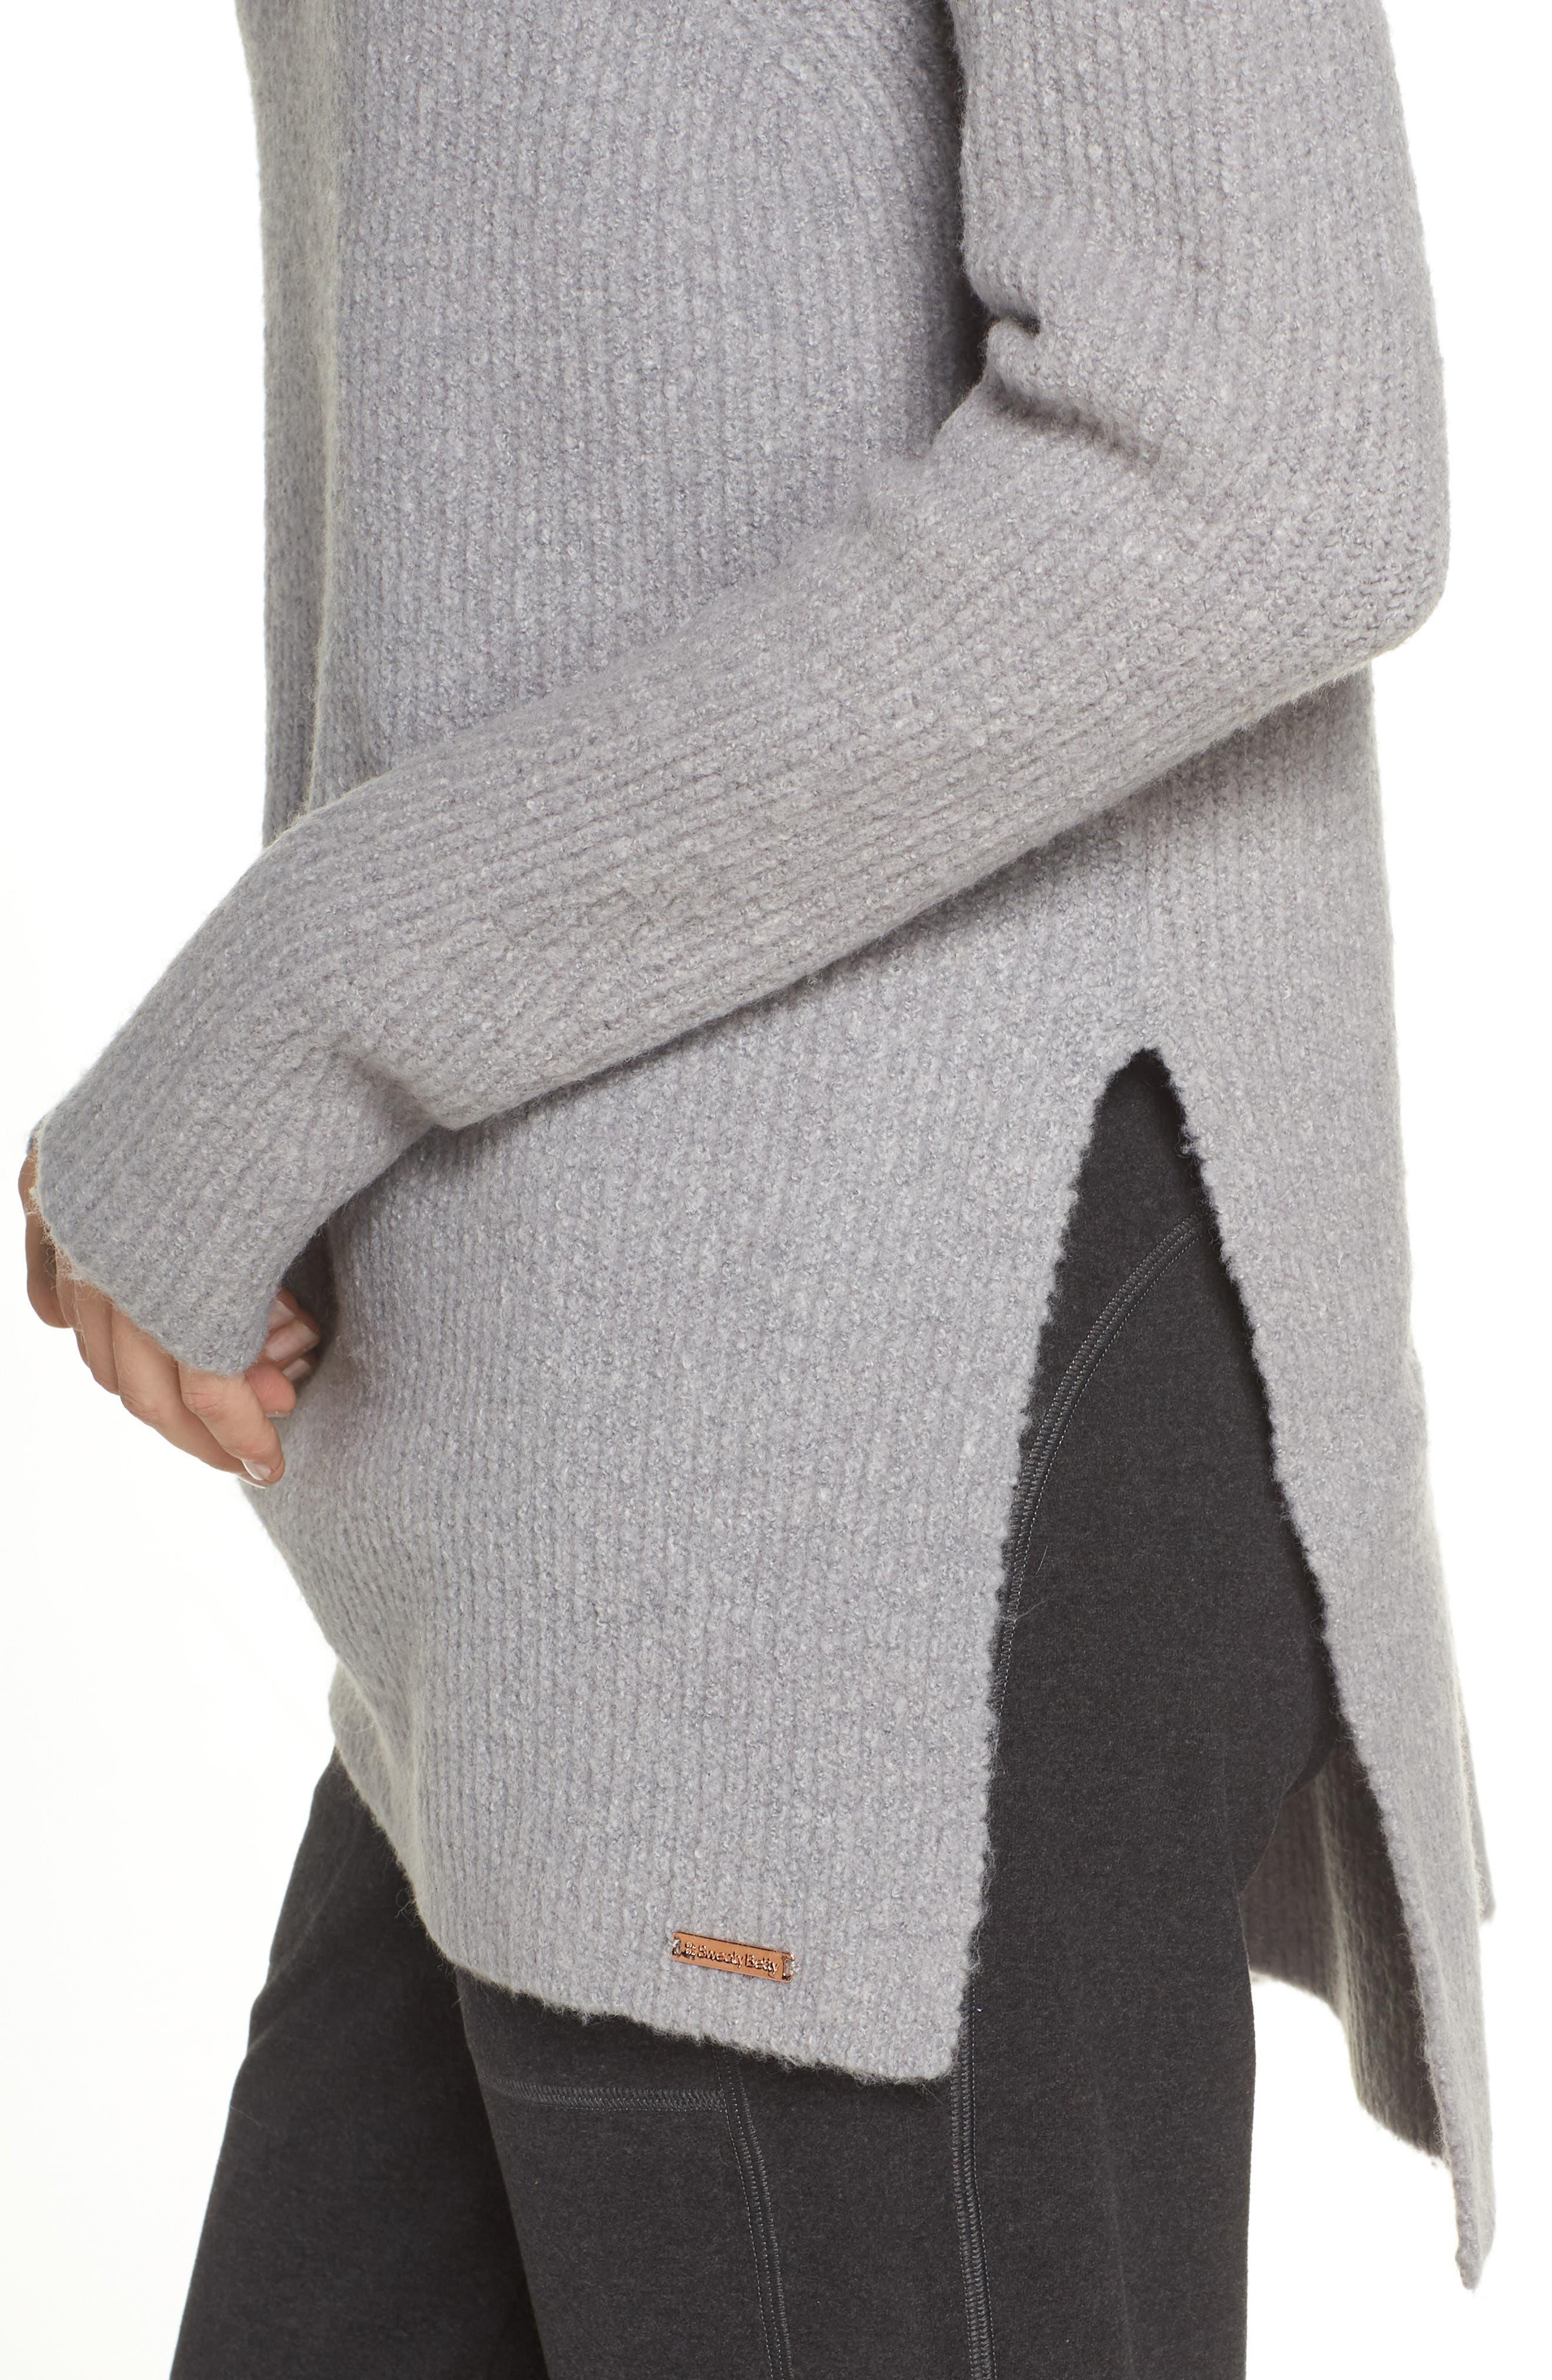 Shakti Oversize Sweater,                             Alternate thumbnail 4, color,                             SILVER GREY MARL